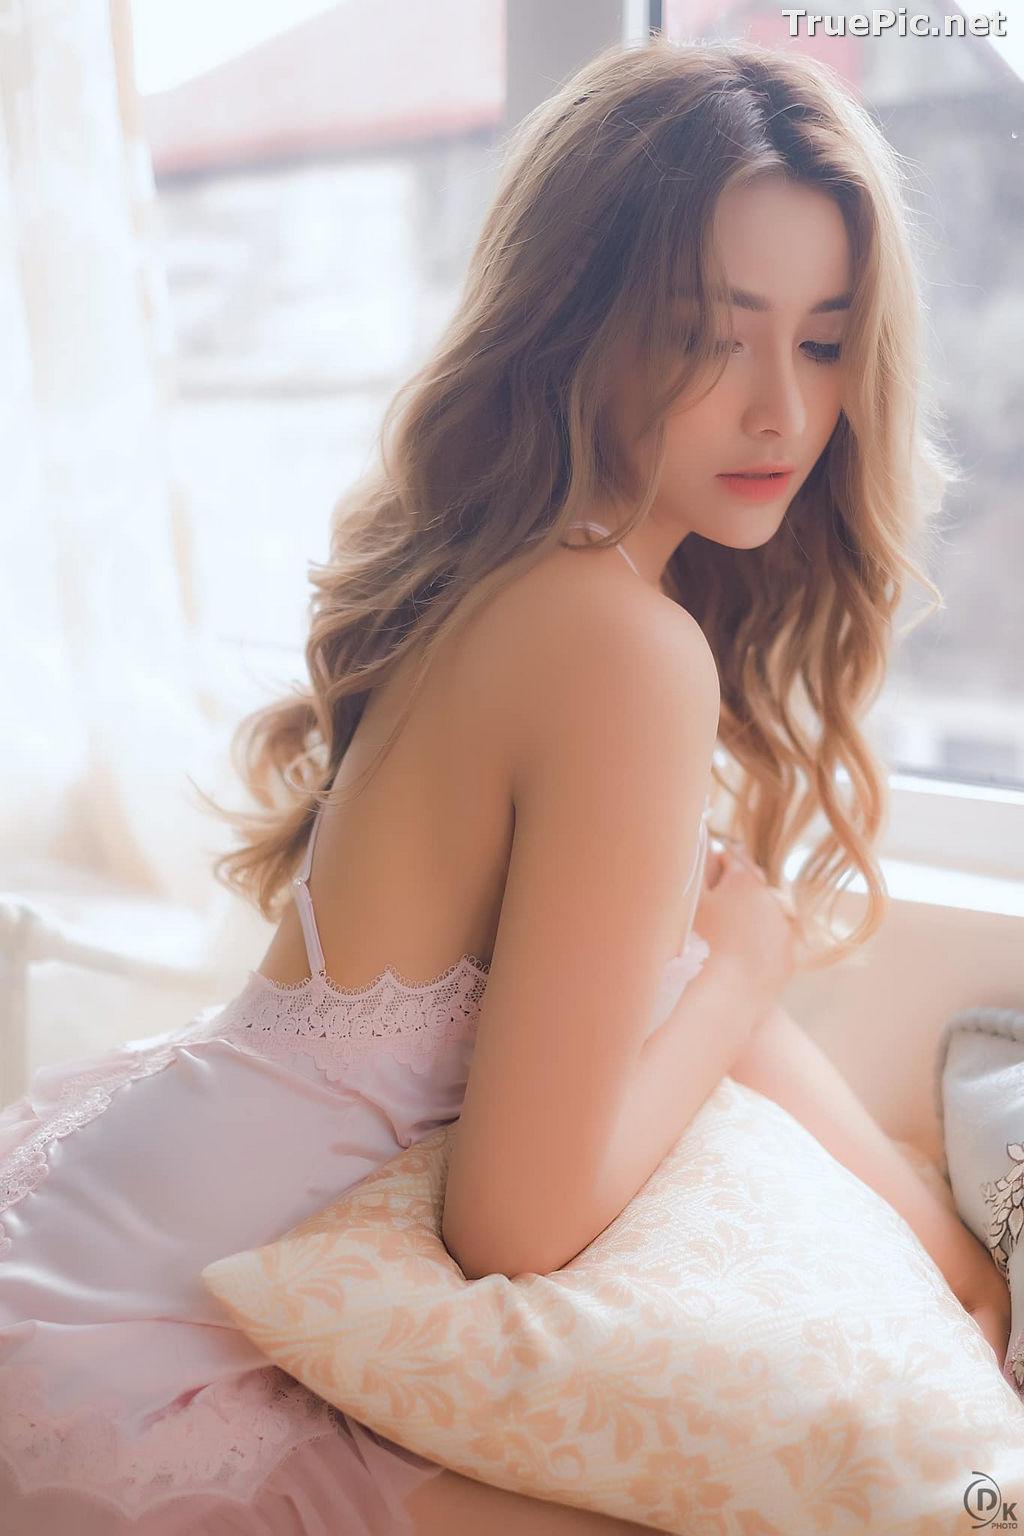 Image Vietnamese Hot Girl - Nguyen Thi Phi Yen - Sexy Beauty Of DJ Girl - TruePic.net - Picture-3